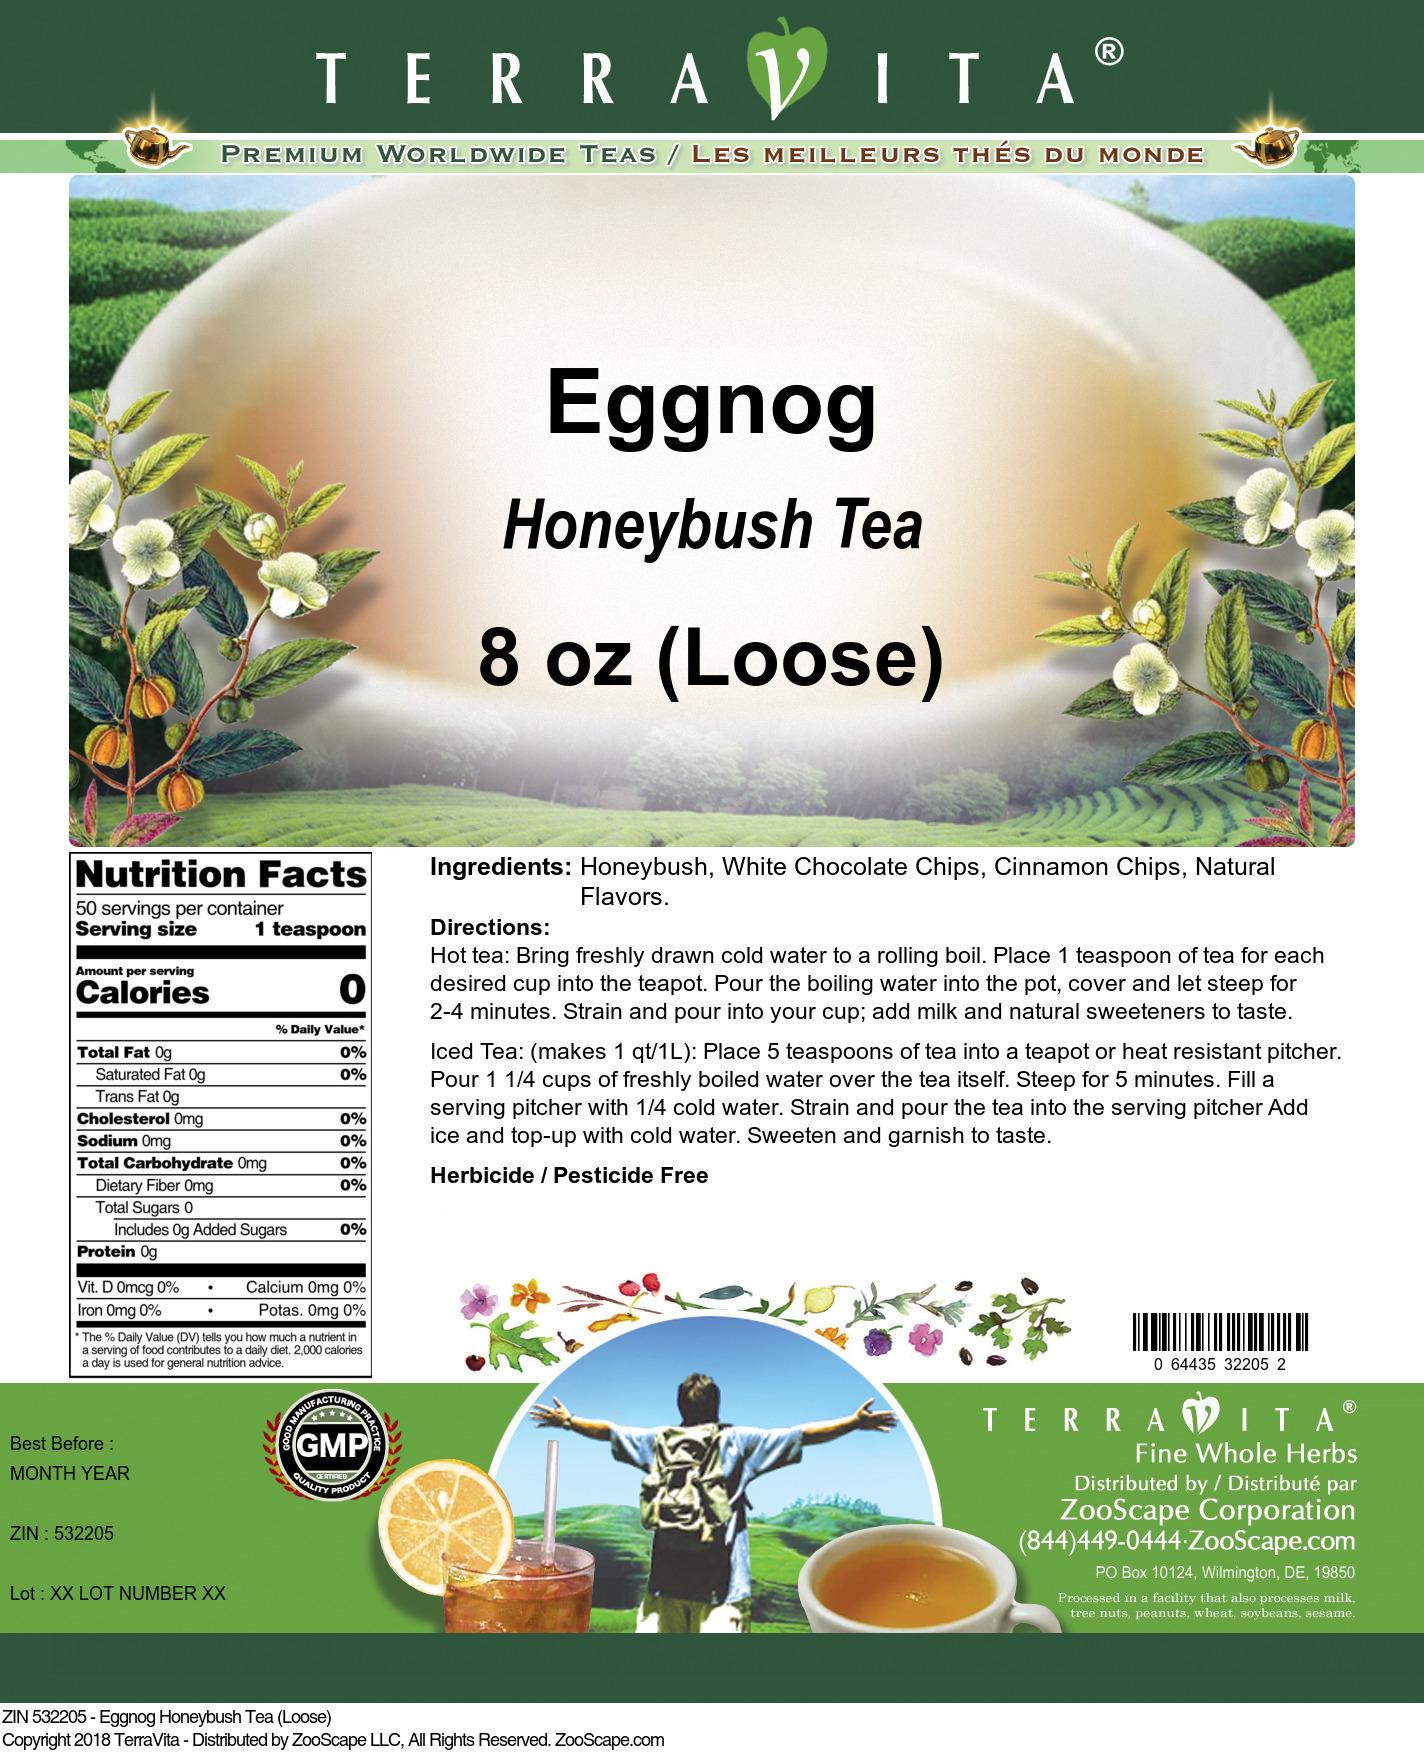 Eggnog Honeybush Tea